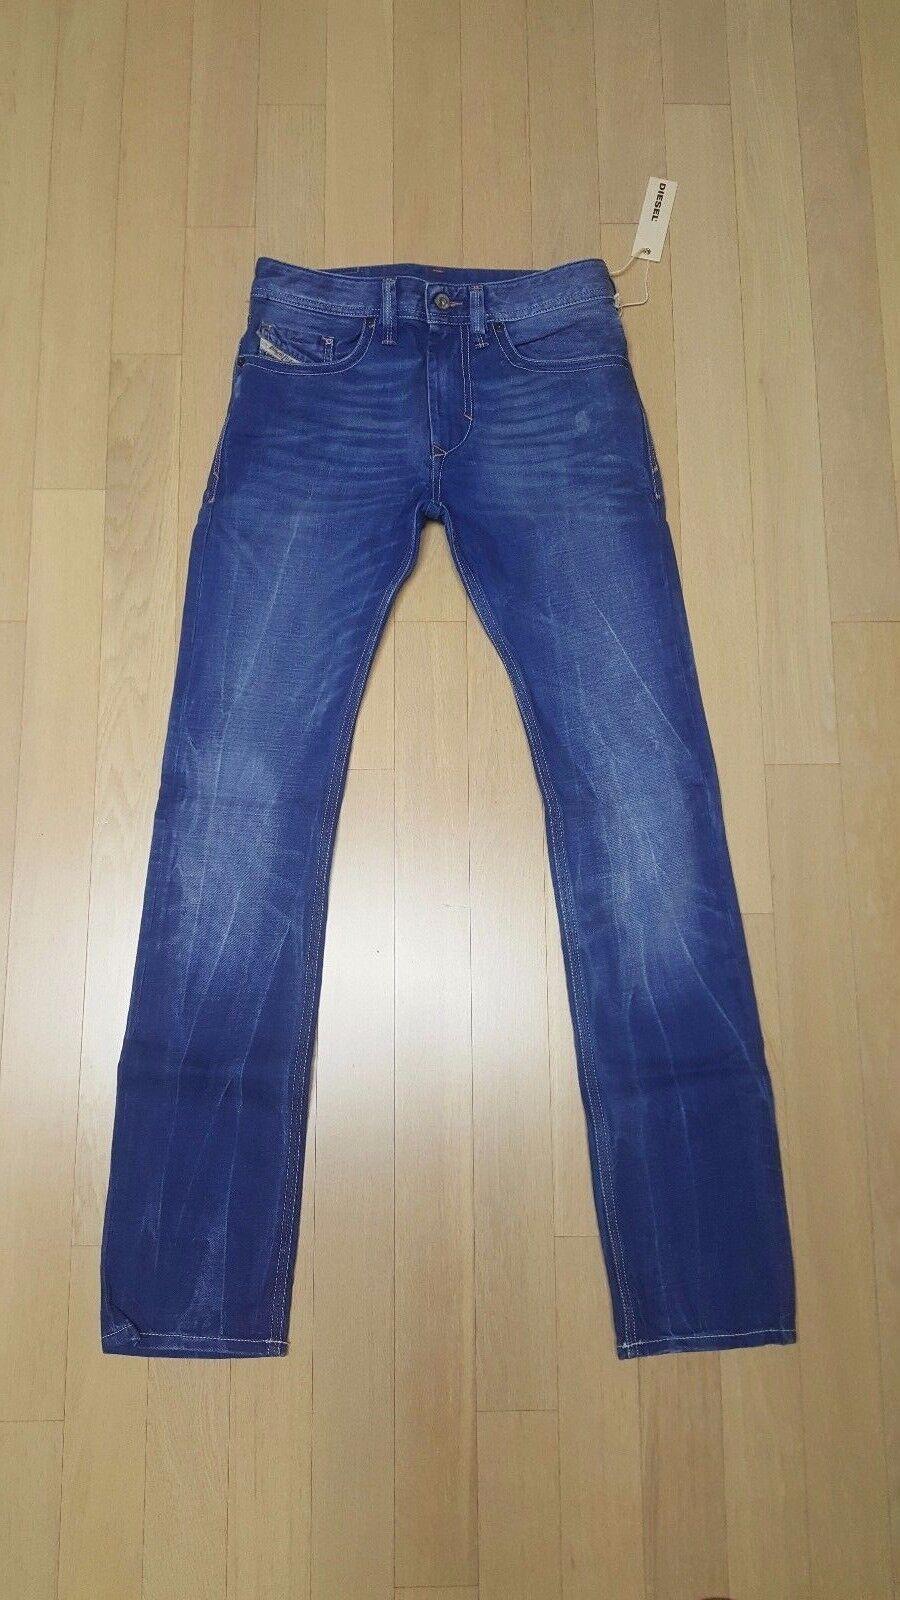 BNWT DIESEL  THANAZ 8pi  Jeans 100% AUTHENTIC Size 27 28 29